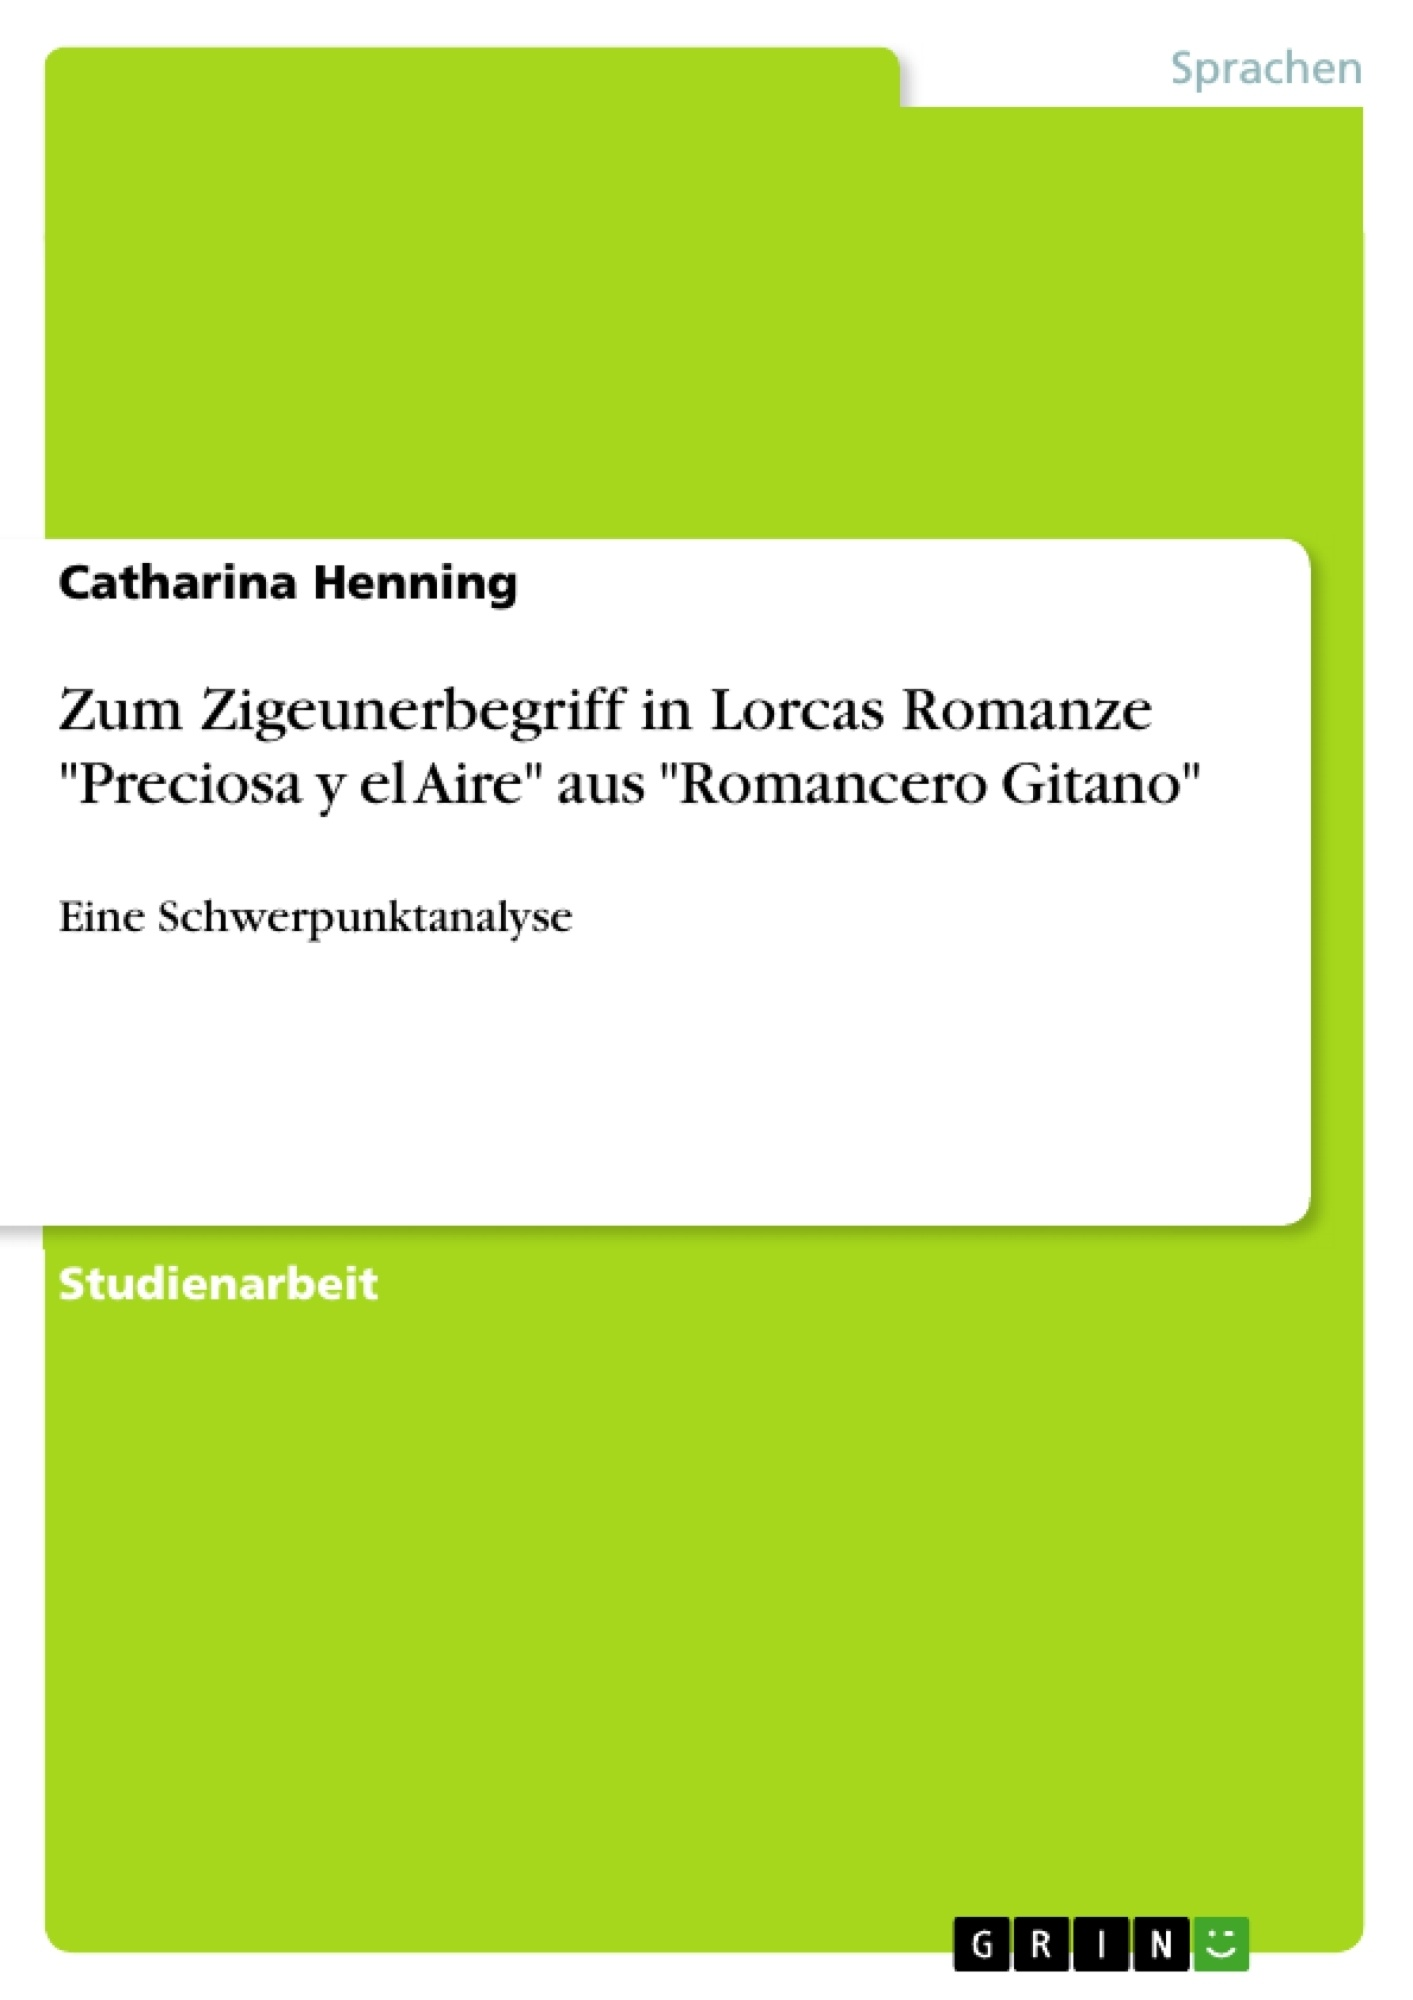 "Titel: Zum Zigeunerbegriff in Lorcas Romanze  ""Preciosa y el Aire"" aus ""Romancero Gitano"""